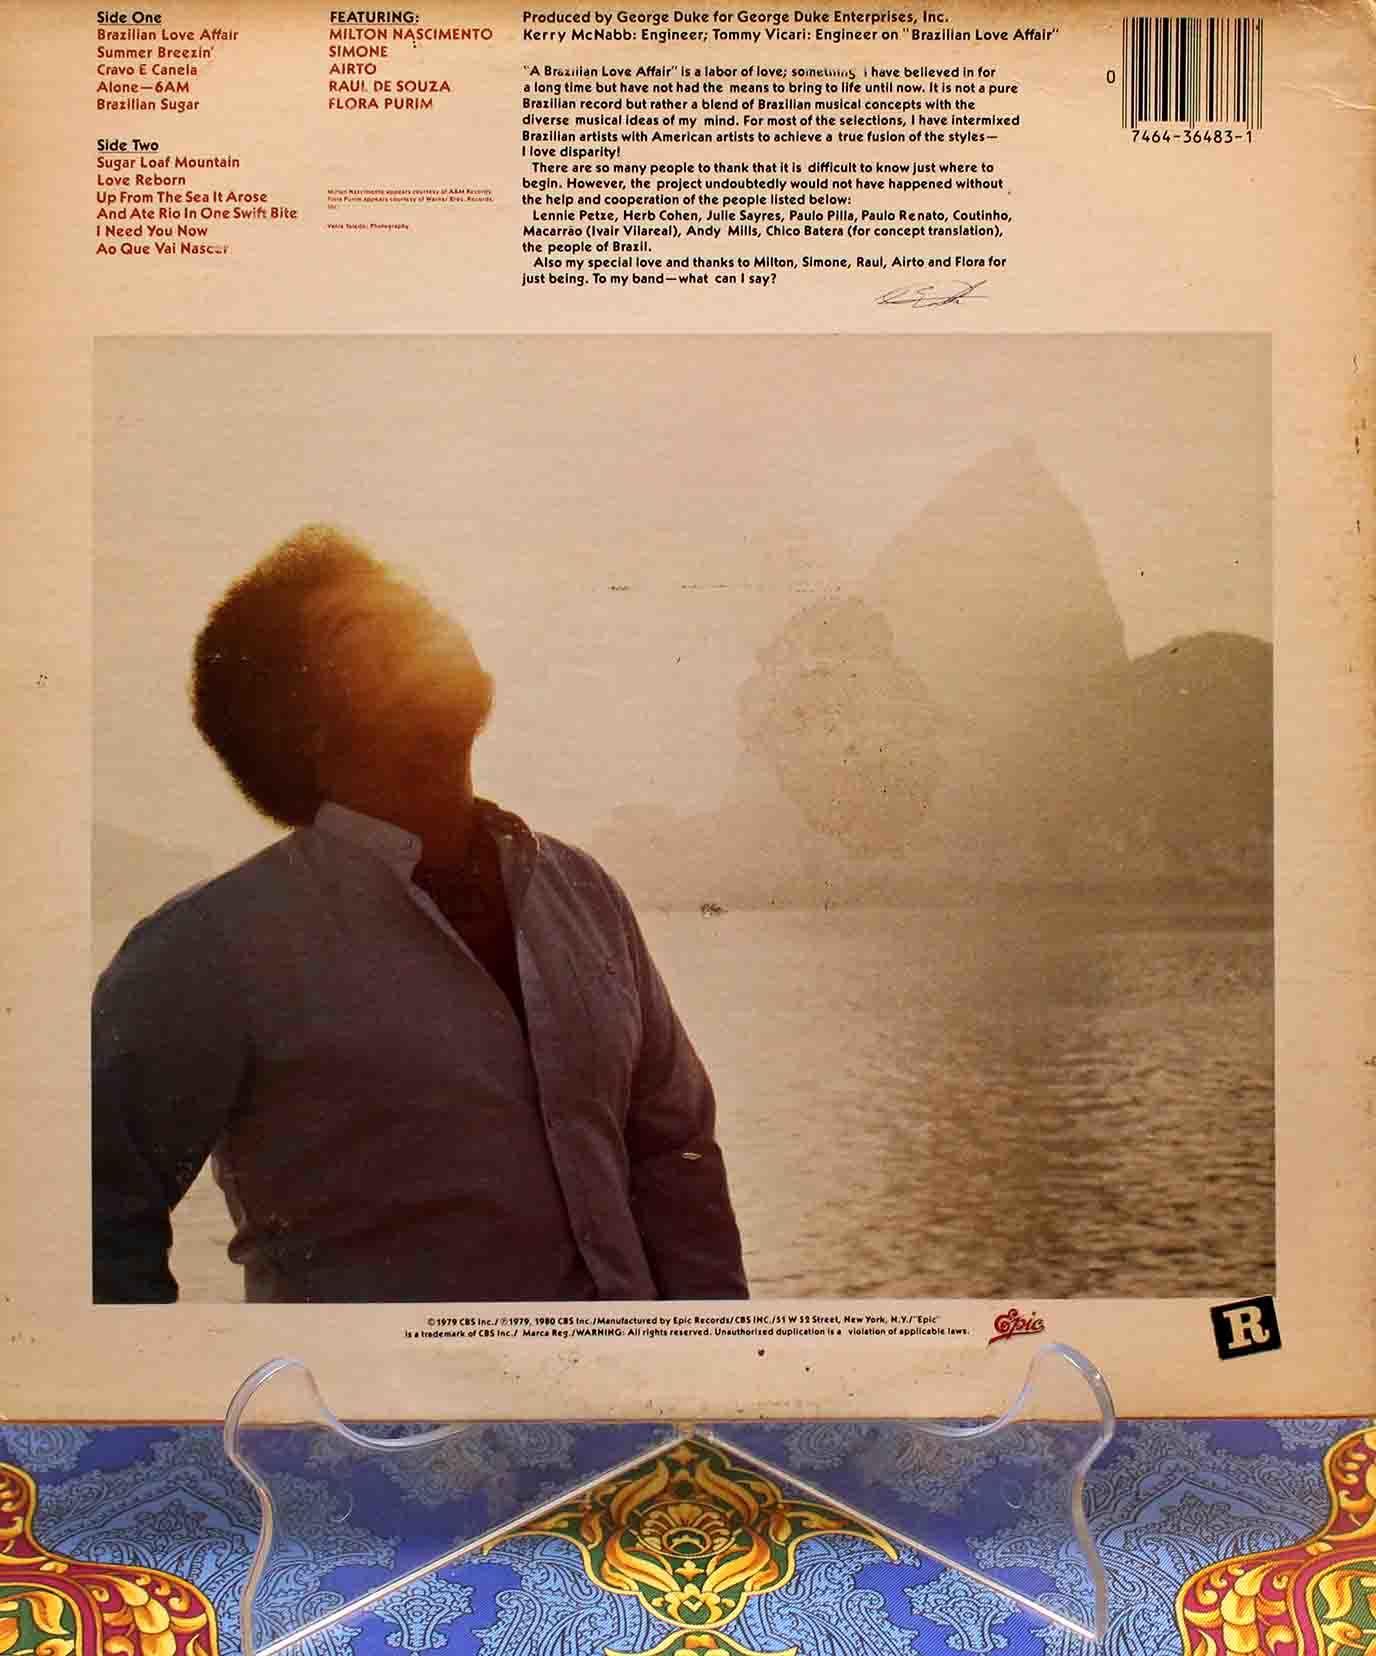 George Duke – Brazilian Love Affair LP 02